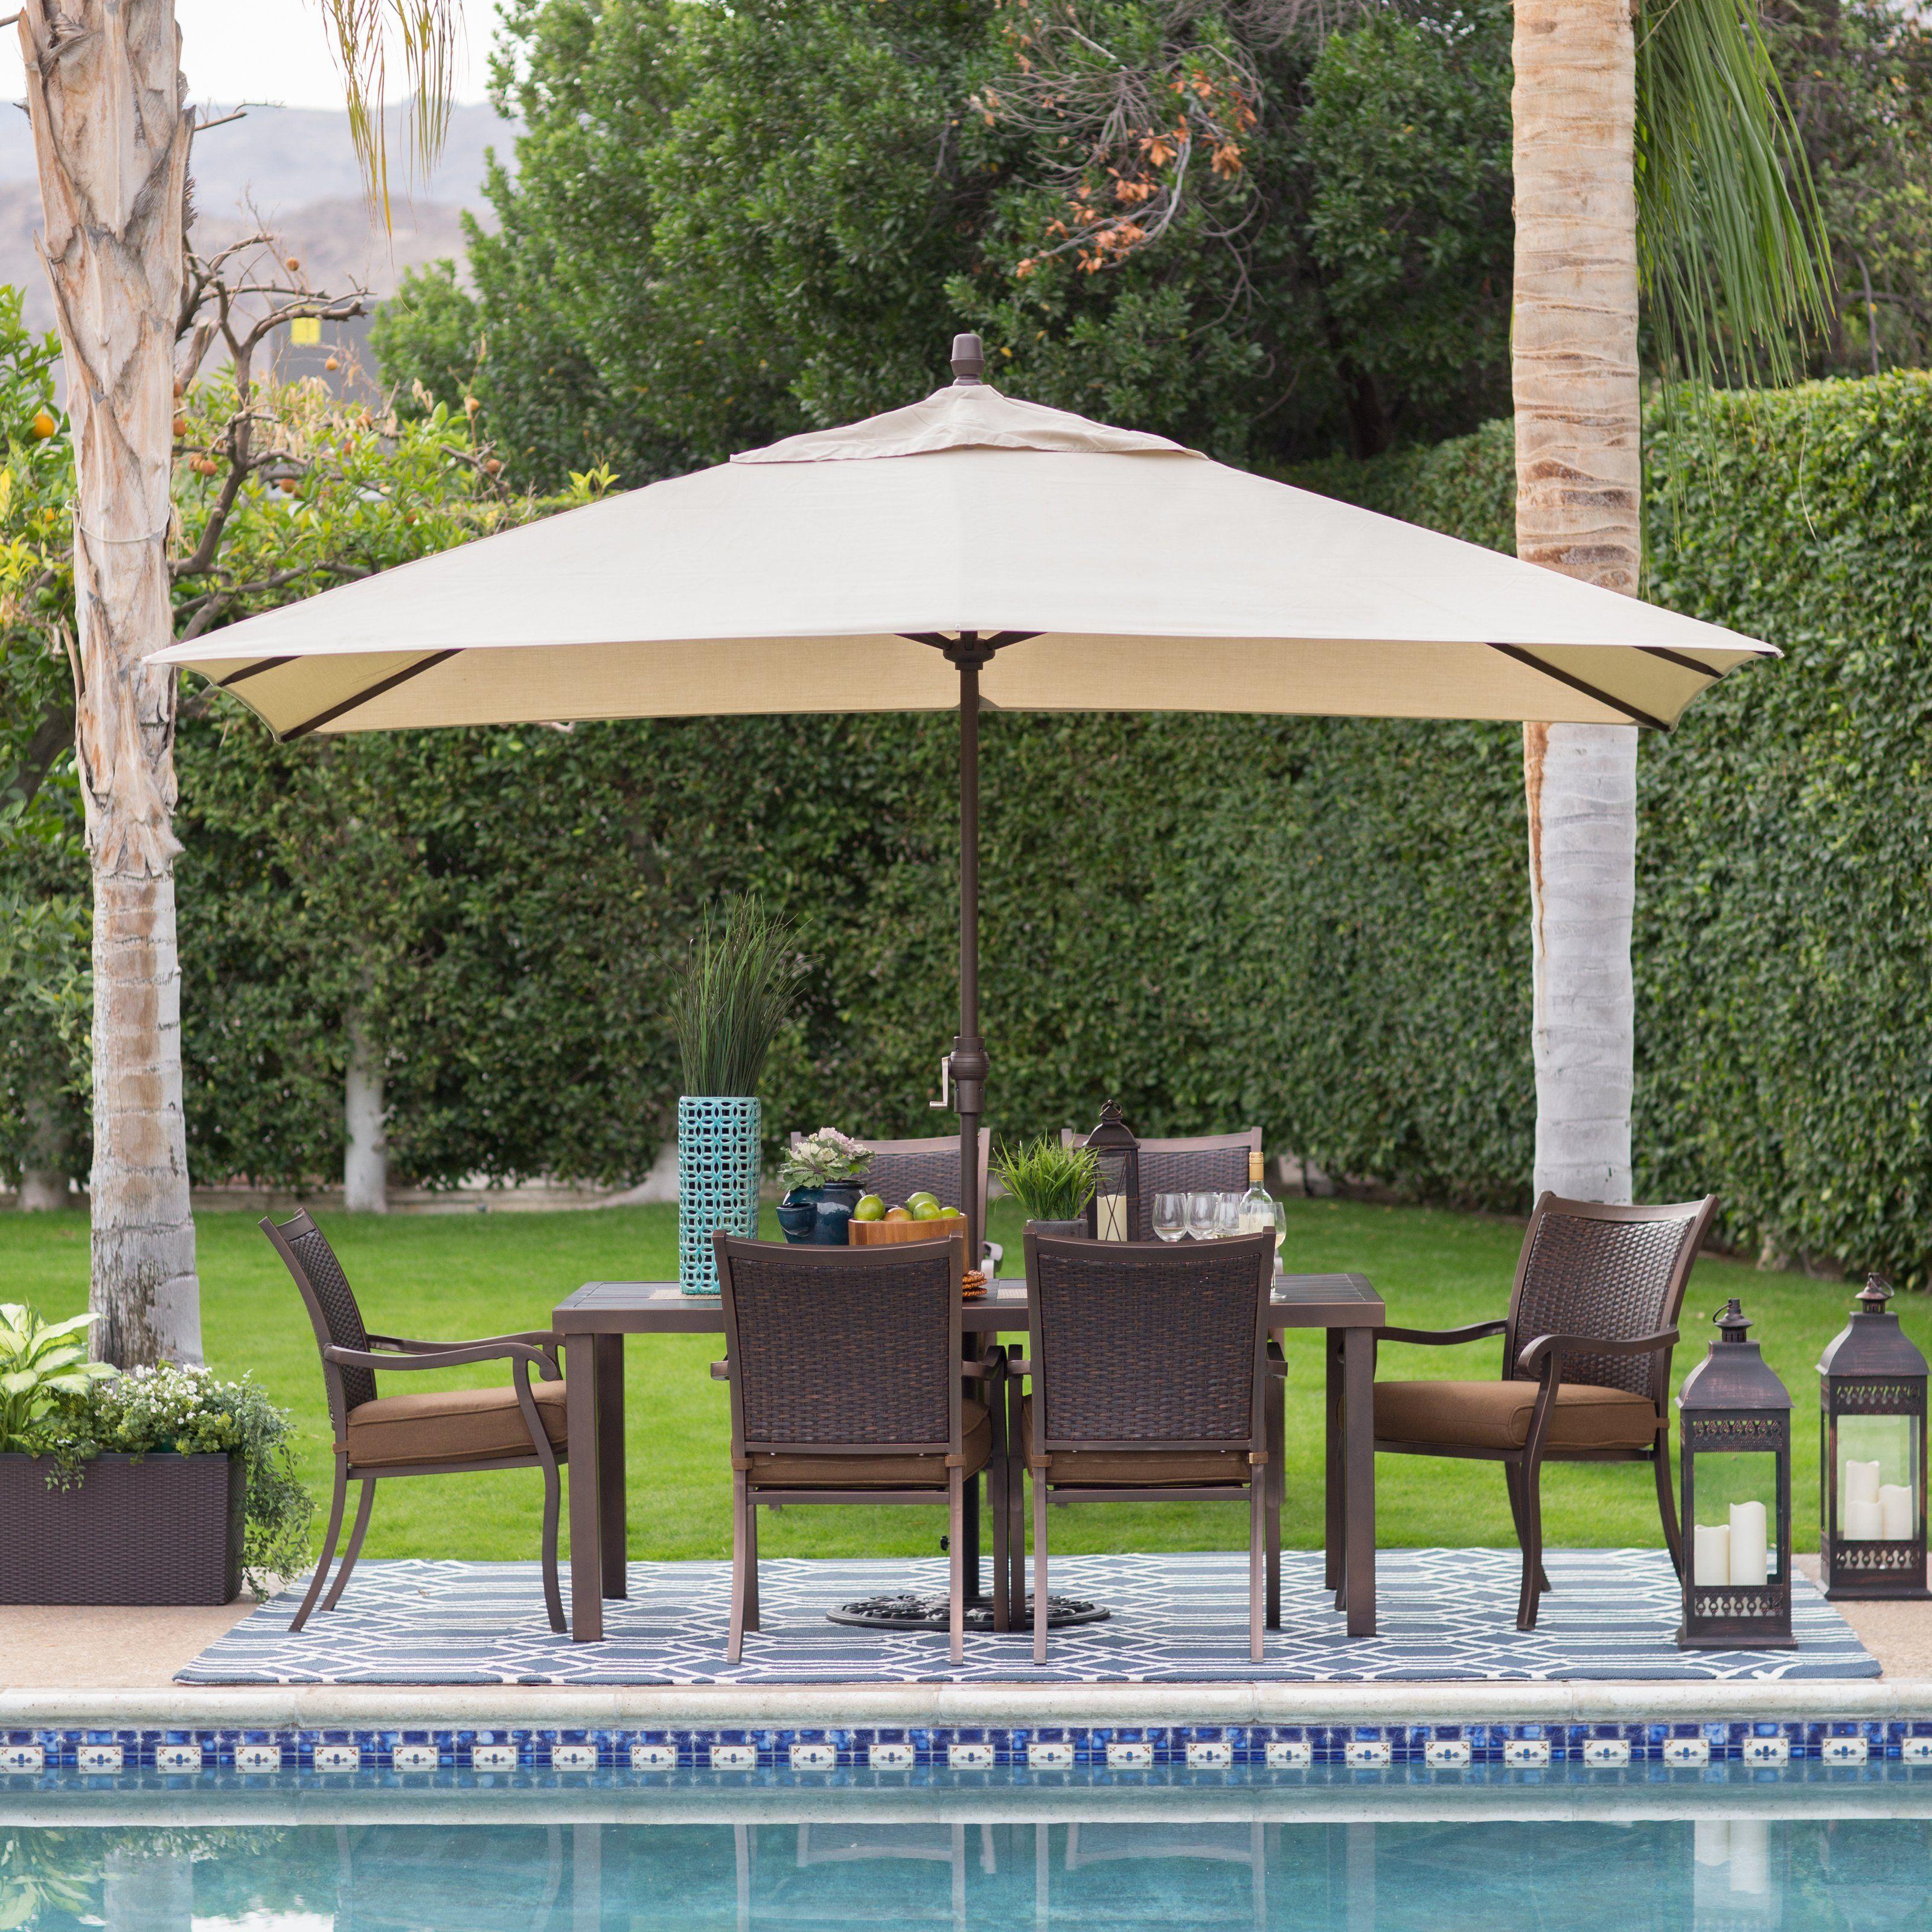 Coral Coast 8 X 11 Ft. Aluminum Rectangle Patio Umbrella